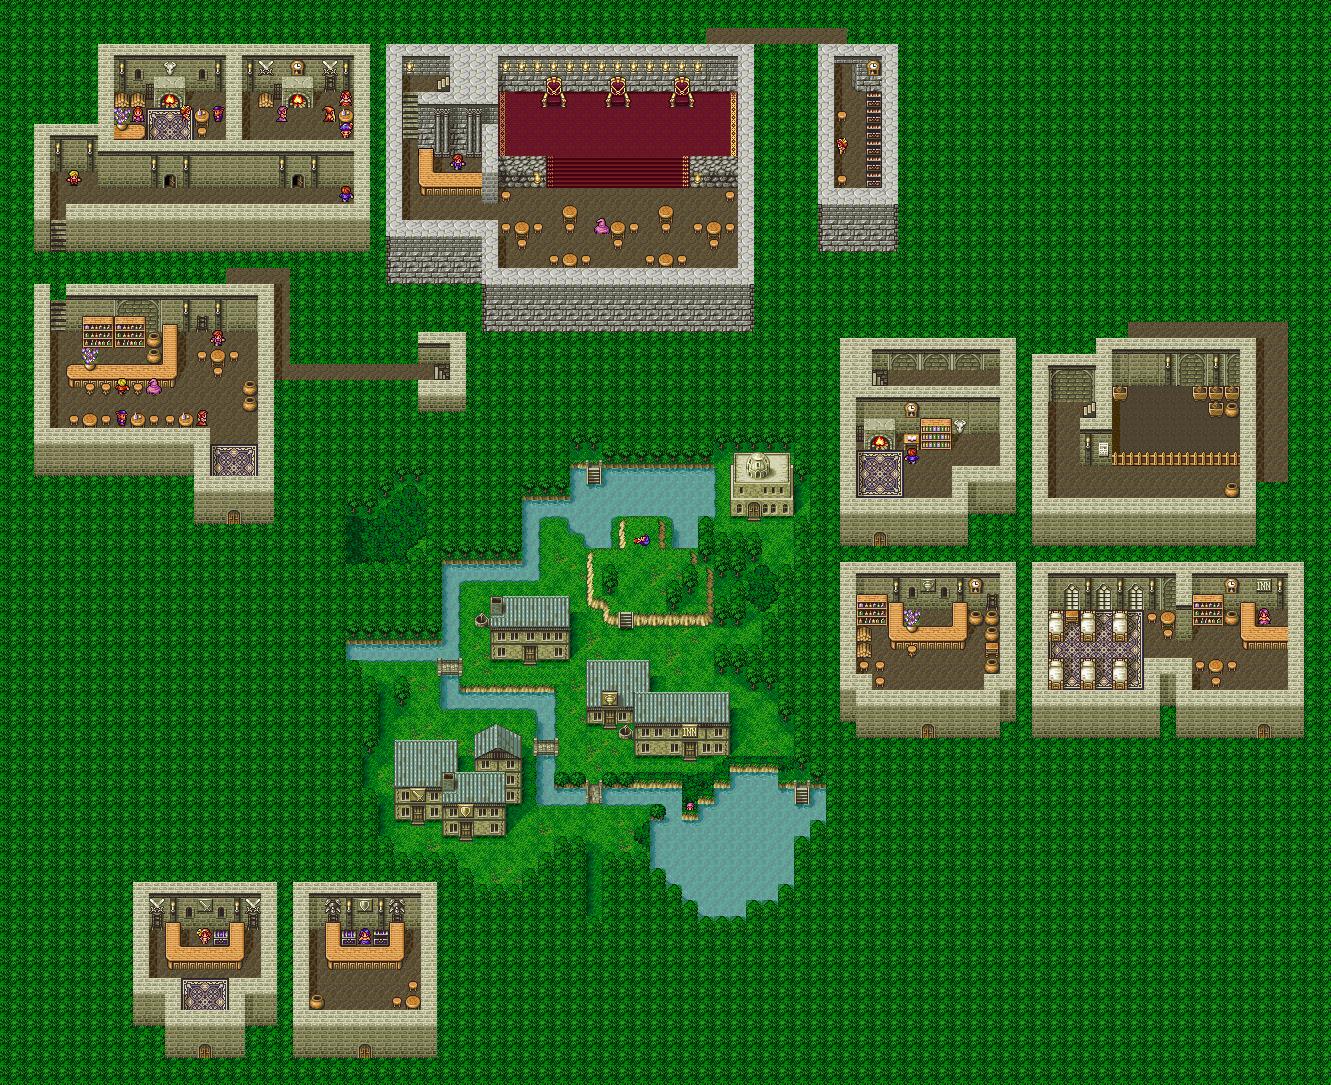 Final Fantasy 4 - Maps